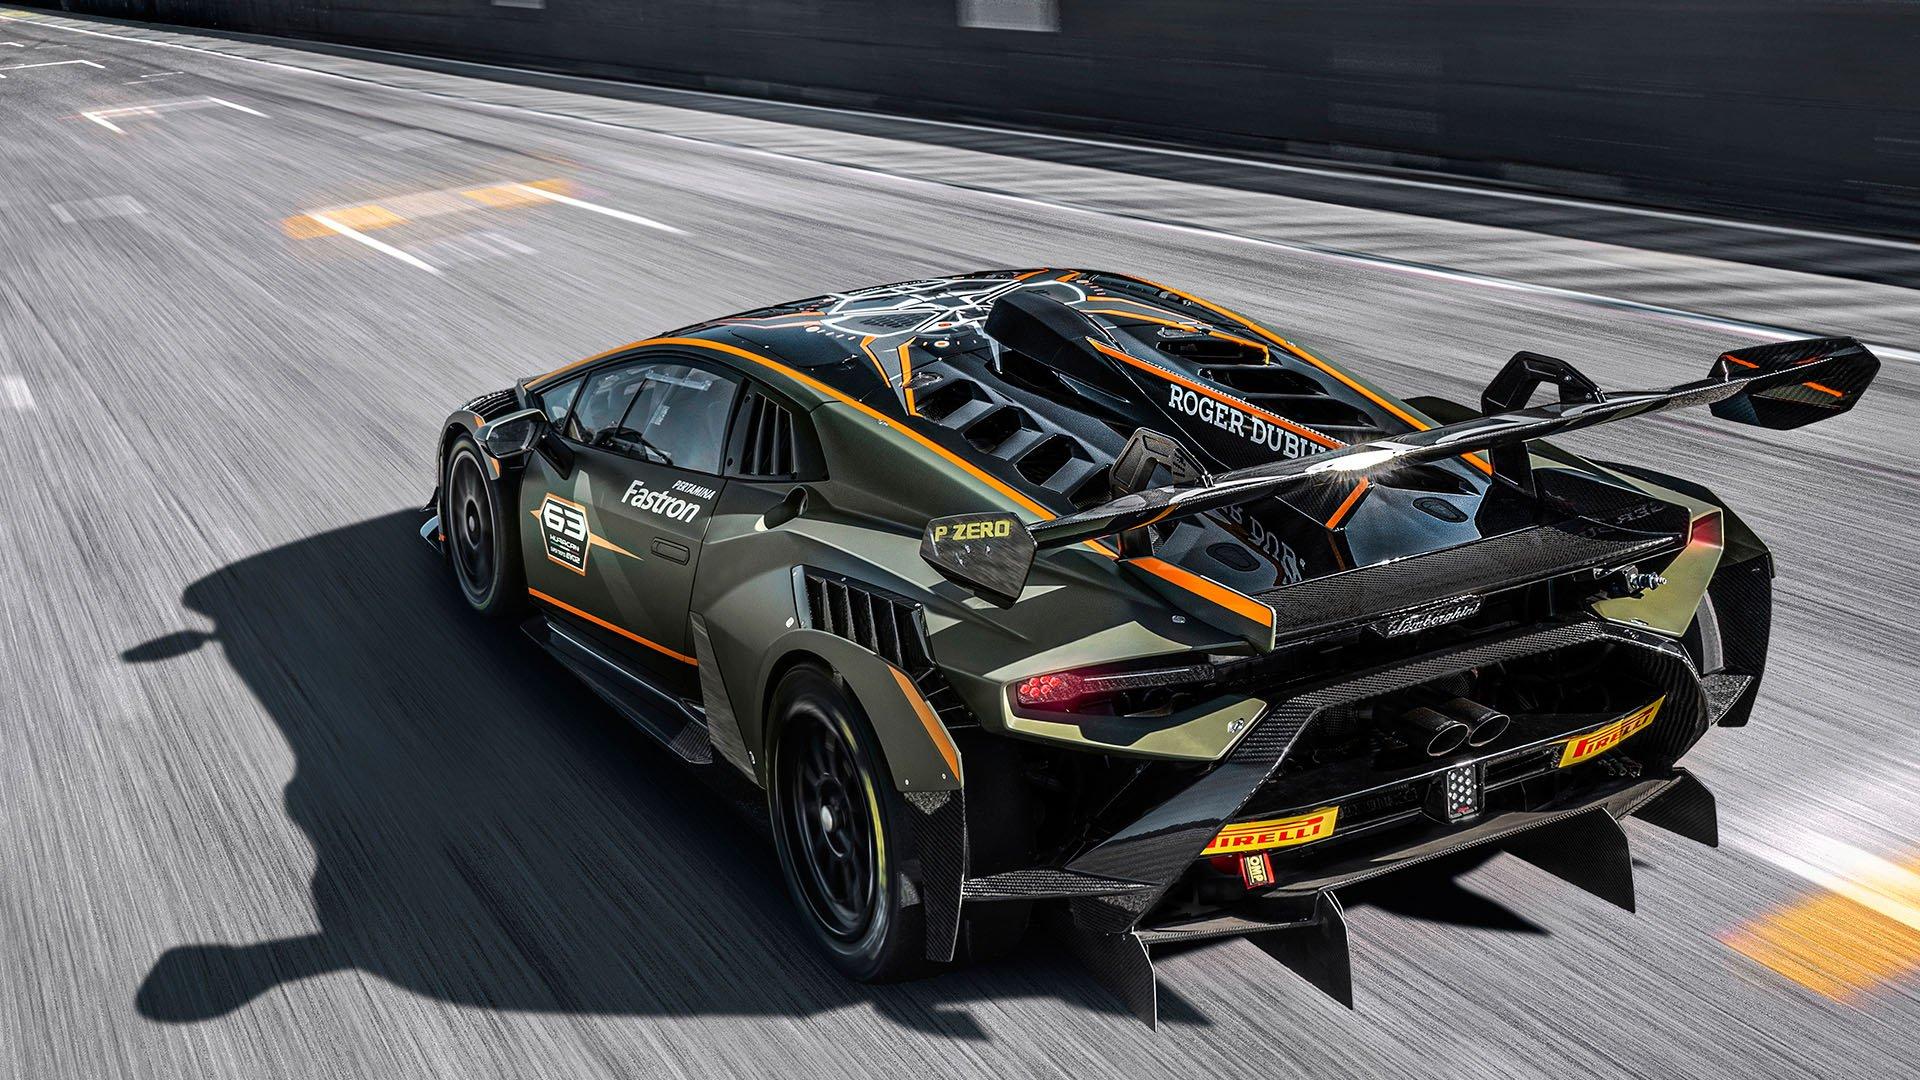 Rear view of the new Lamborghini Huracán Super Trofeo EVO2